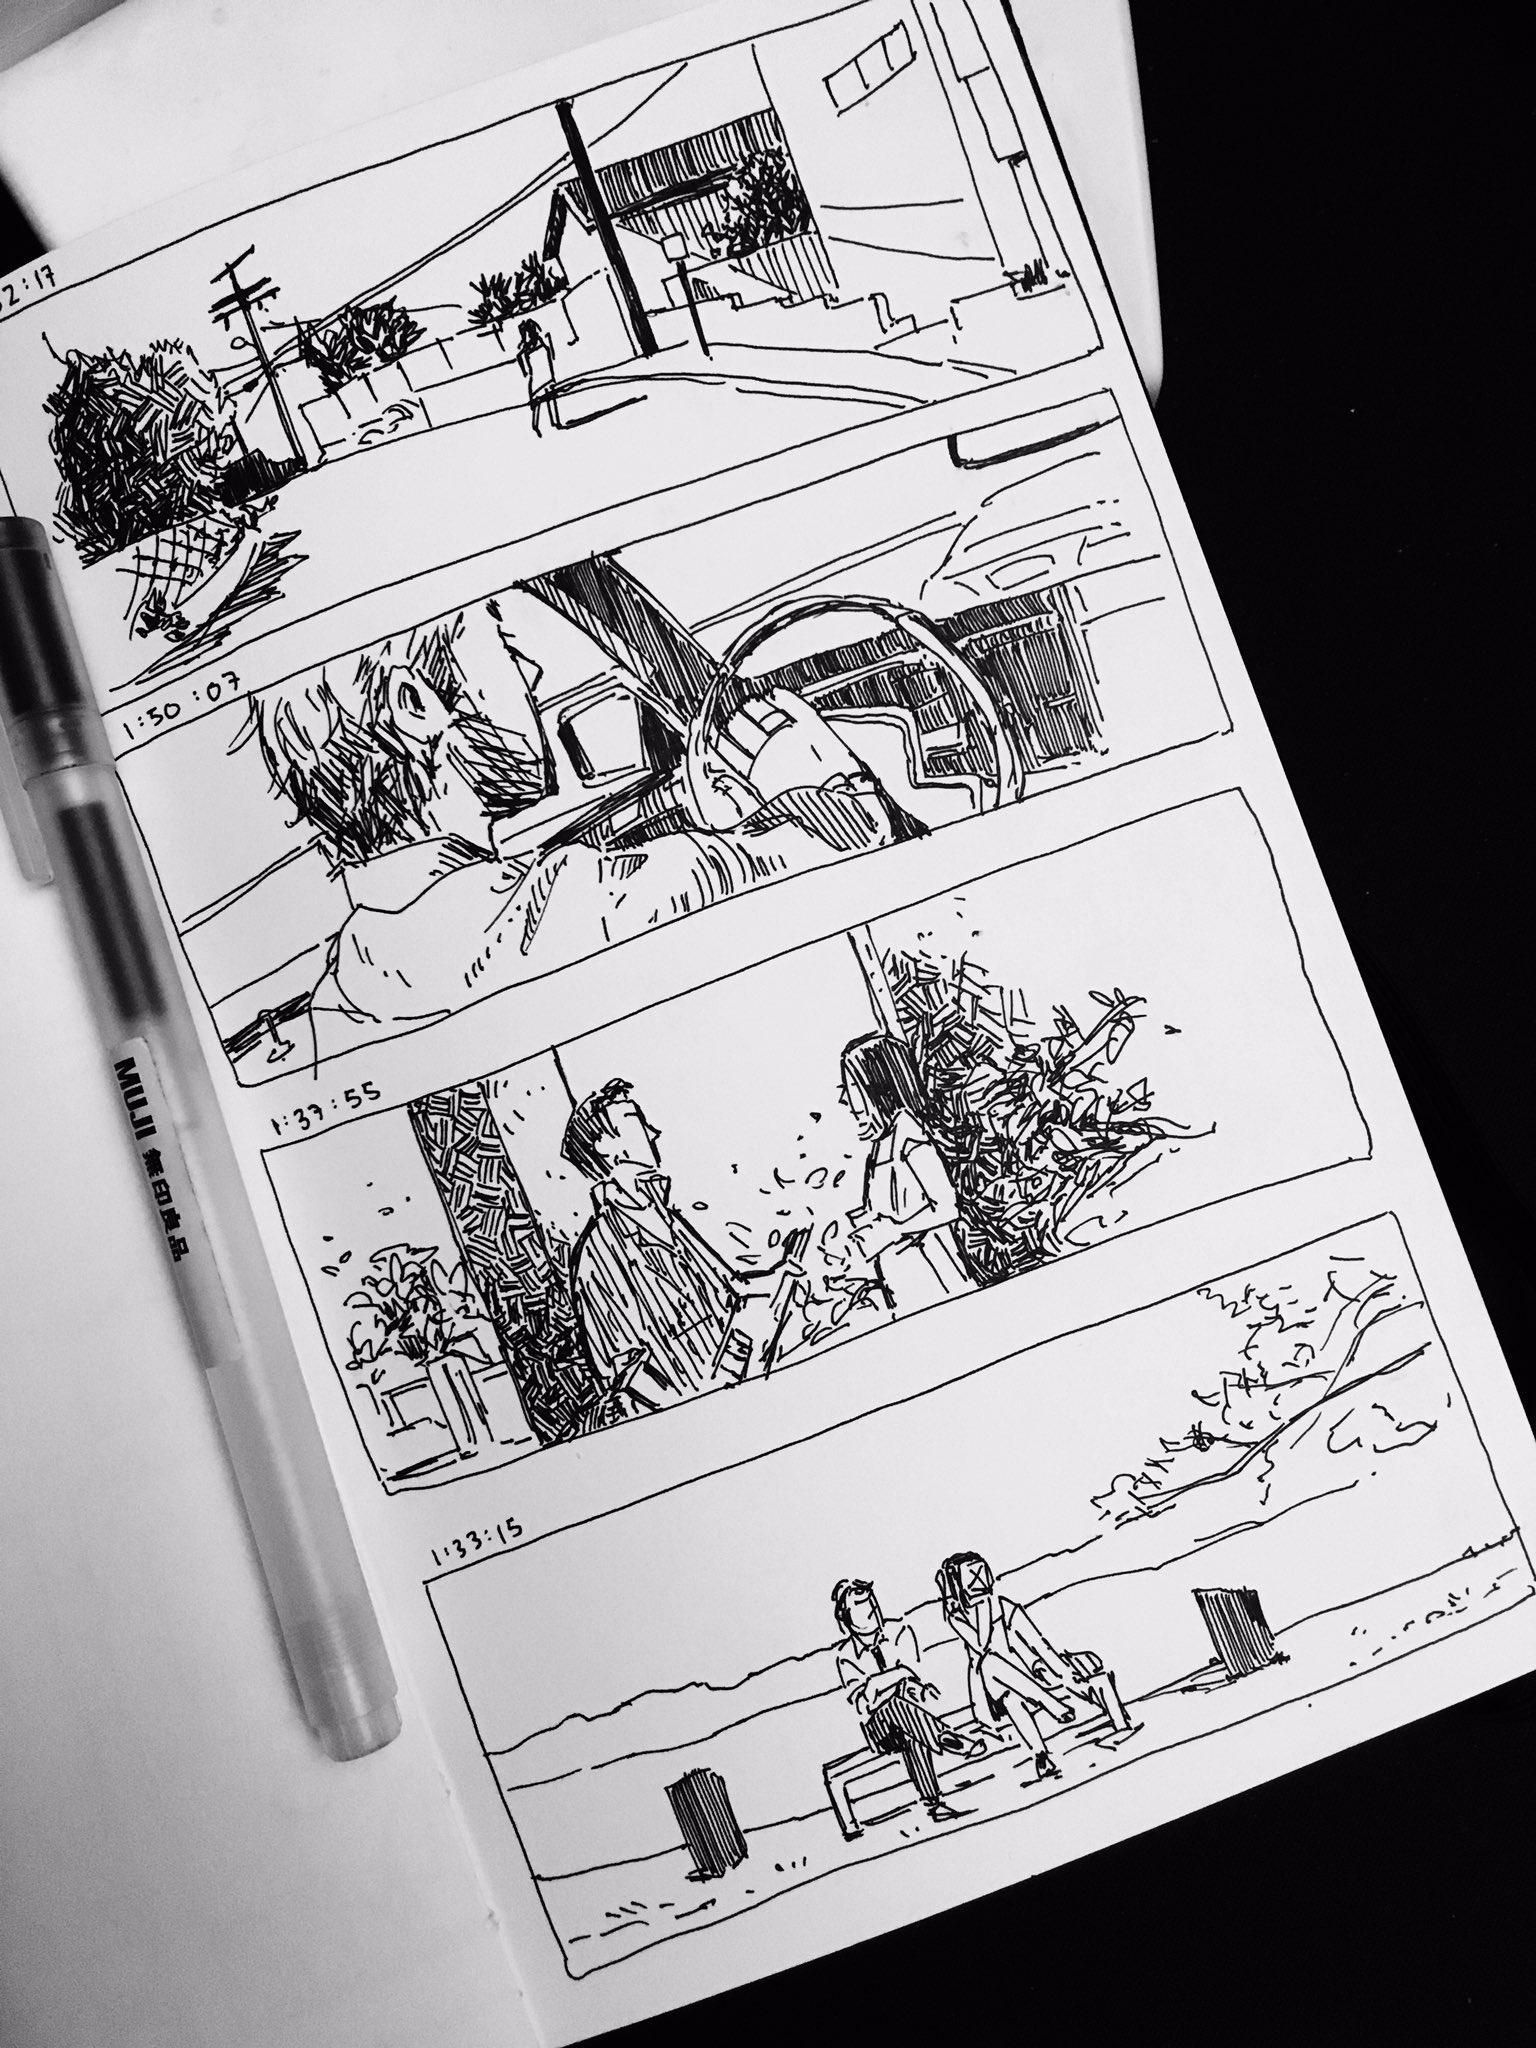 Scenes include an empty road, Sebastian honking his car horn, Sebastian and Mia talking at a party, and Sebastian and Mia sitting on a bench.